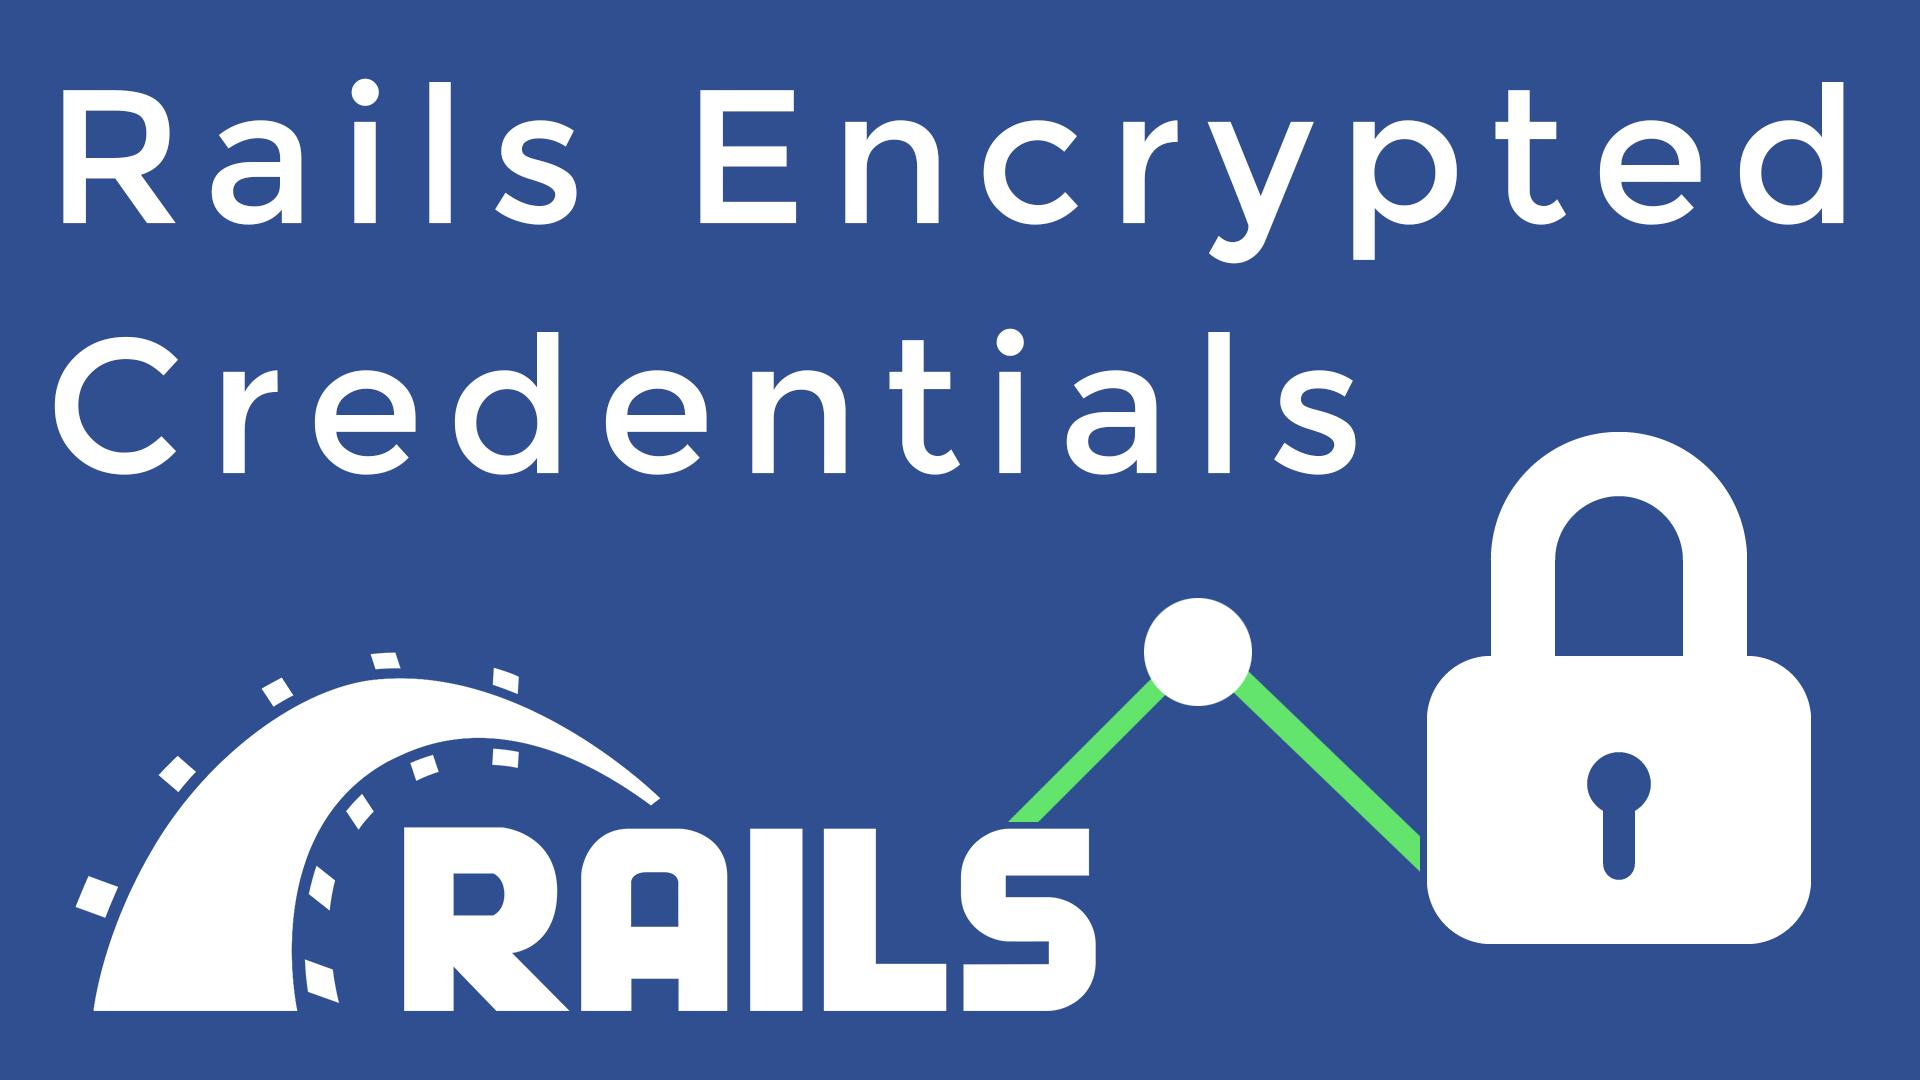 Rails encrypted credentials